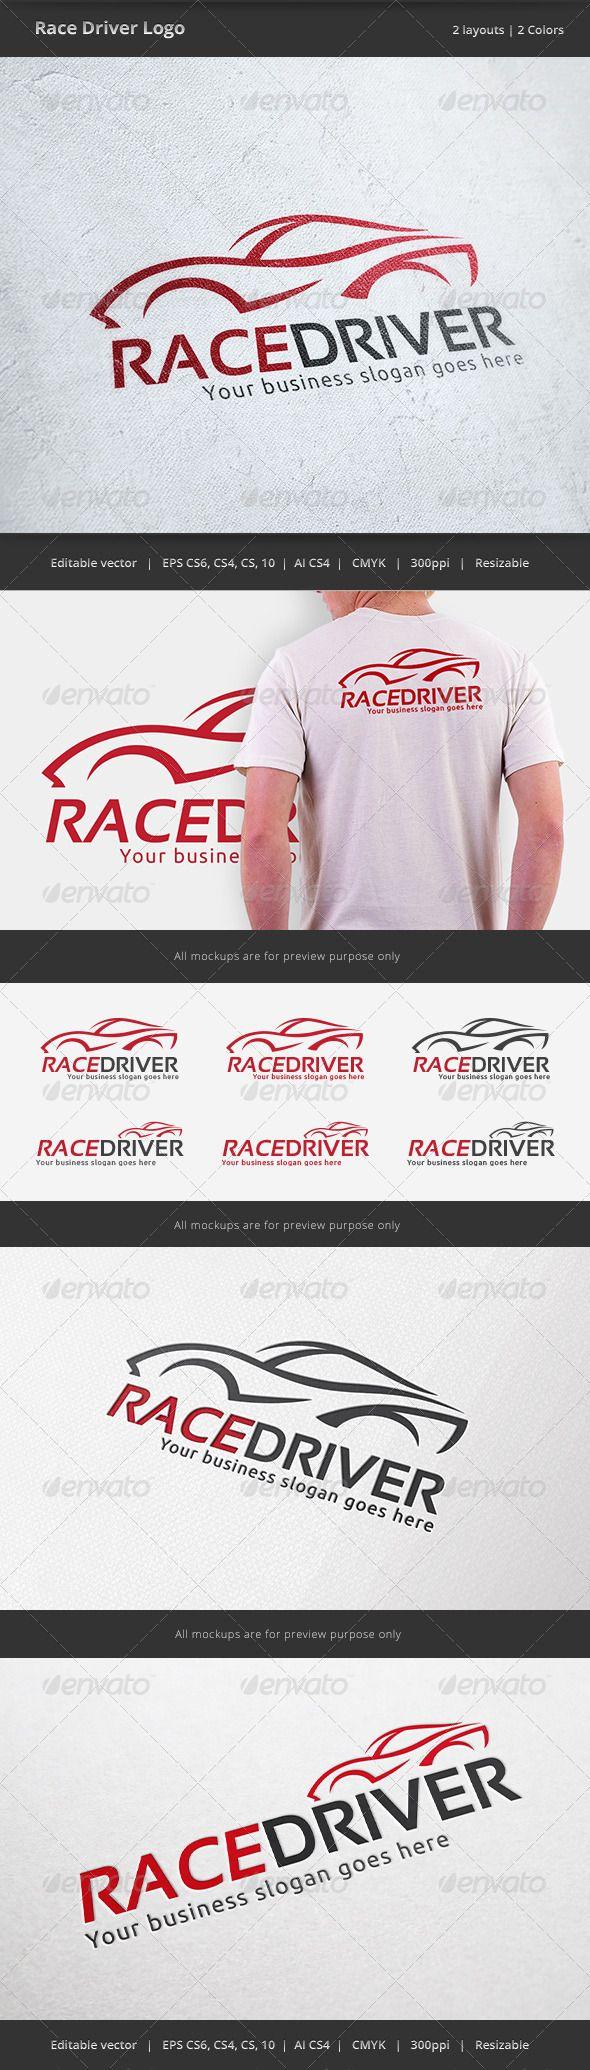 Race Car Driver Logo